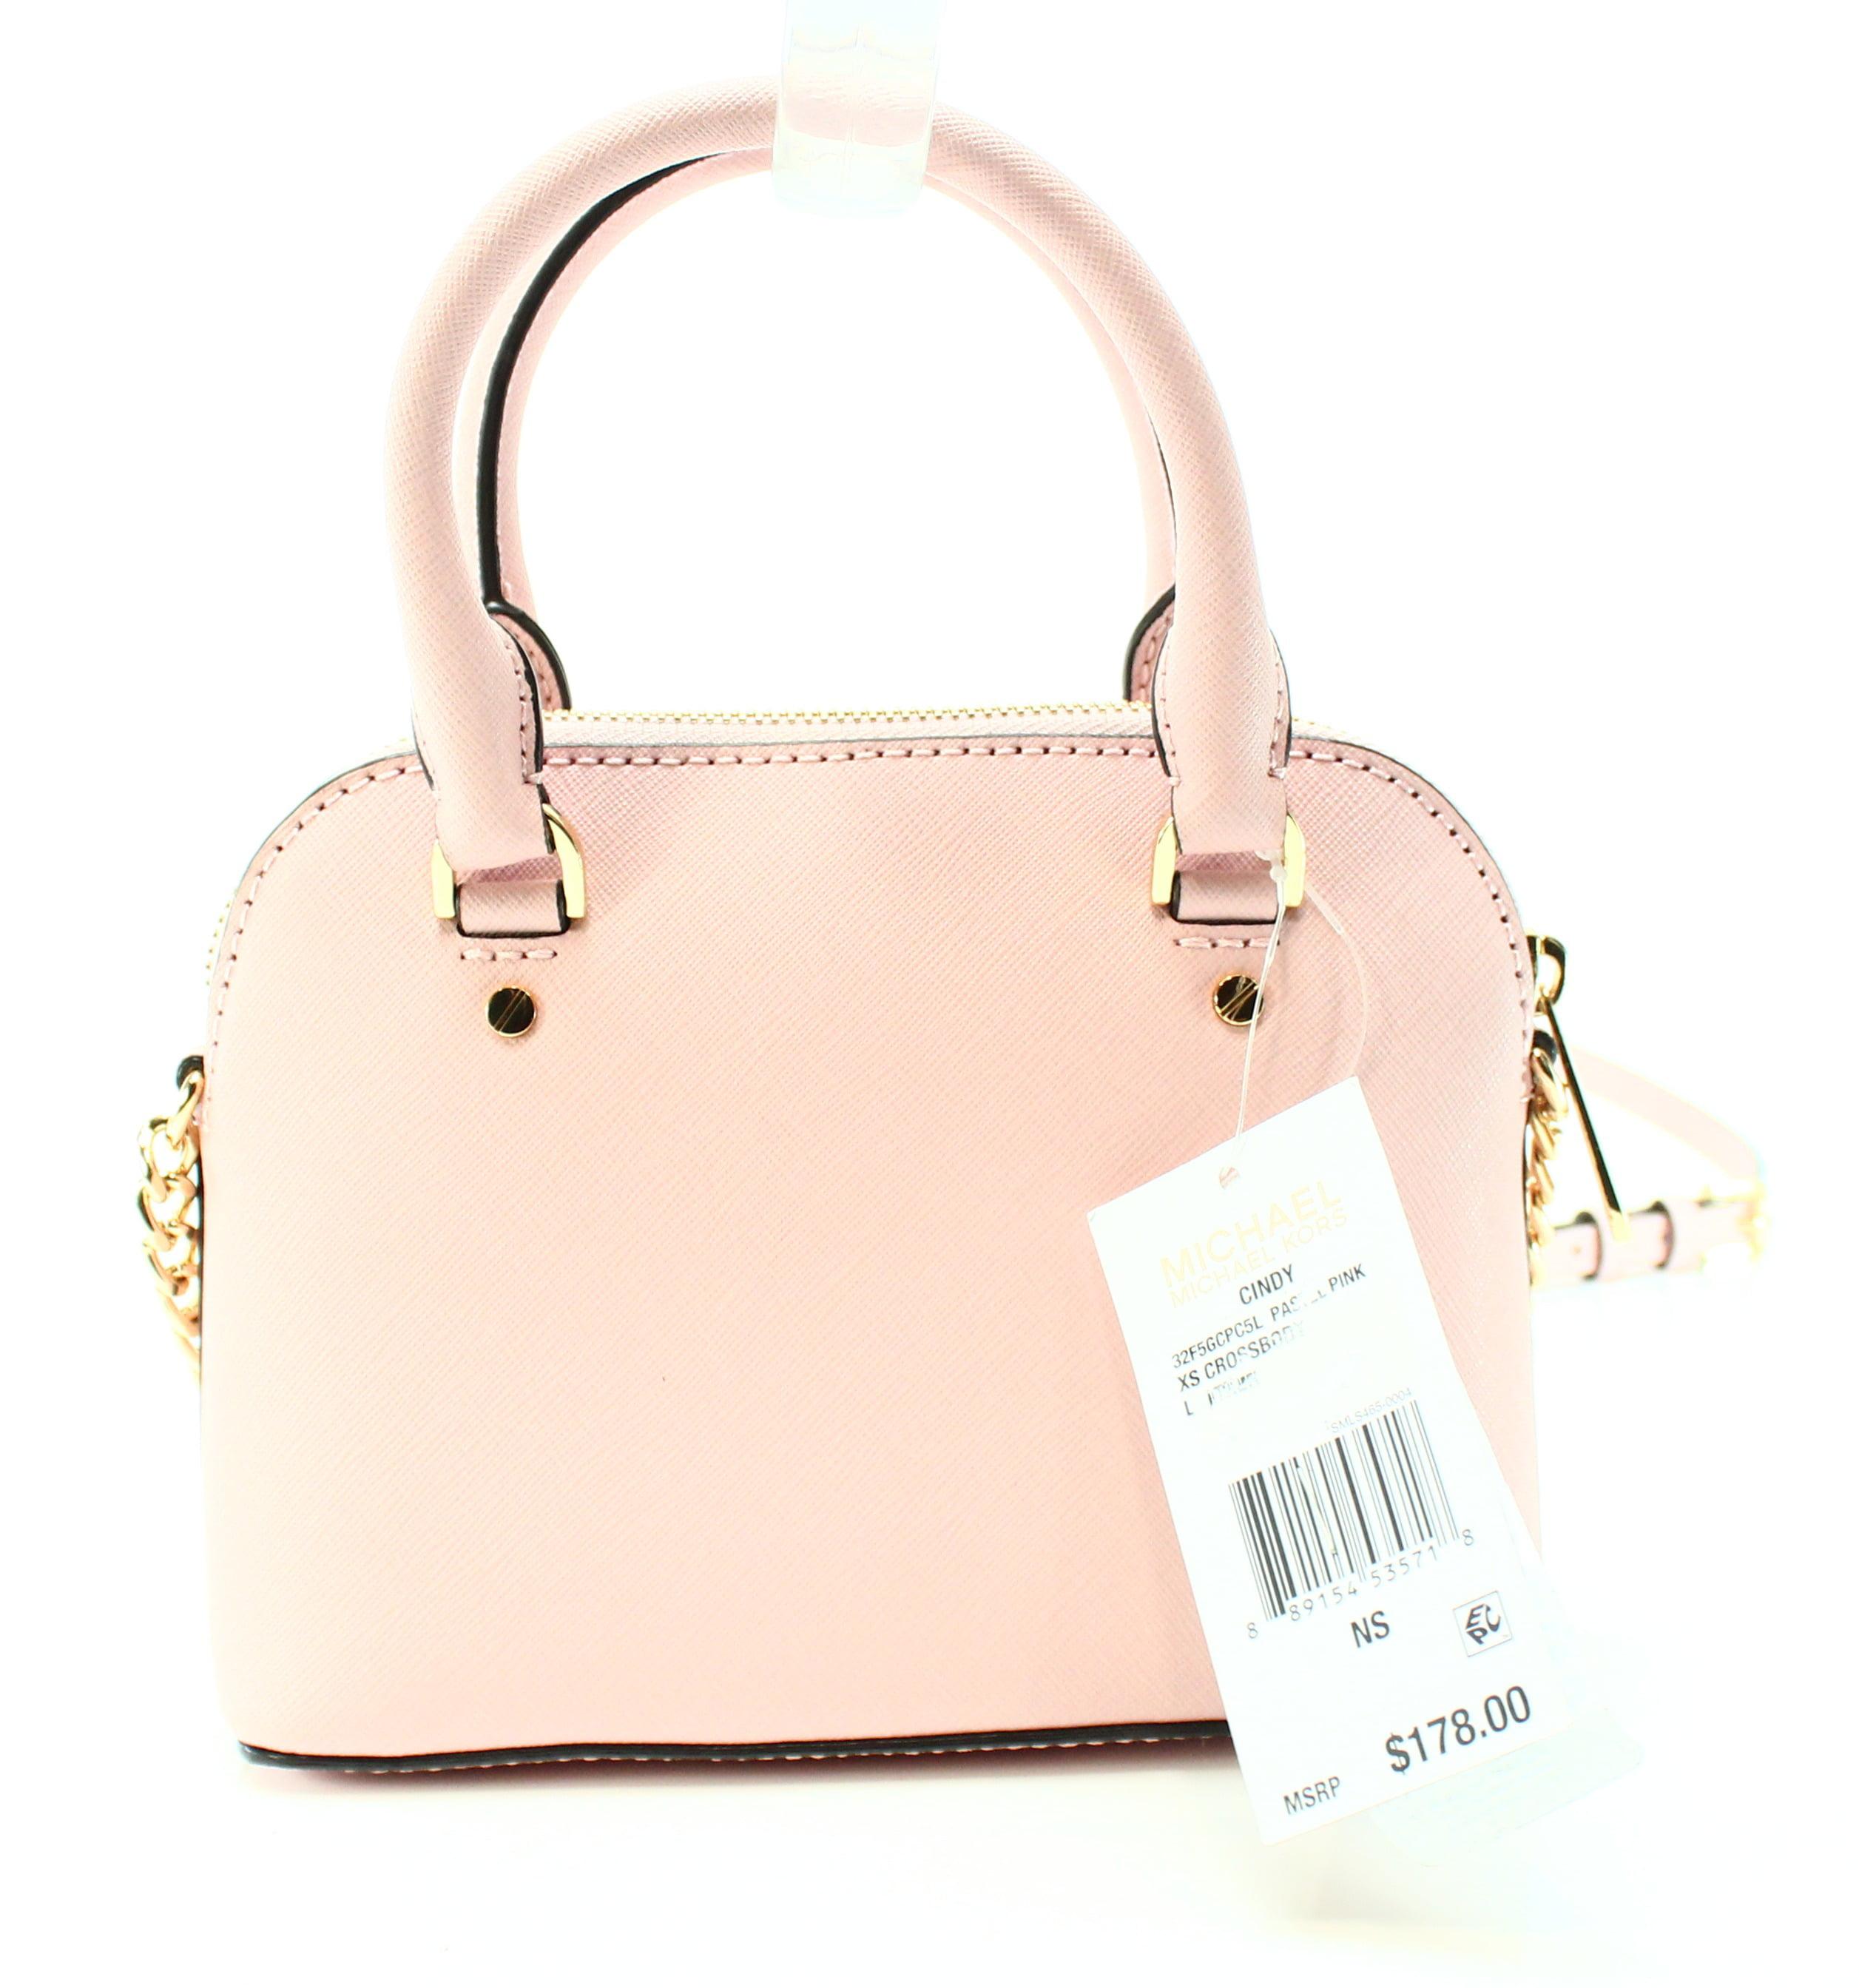 dcc50aed3366 ... usa michael kors michael kors new pastel pink saffiano cindy mini  crossbody bag purse walmart e1419